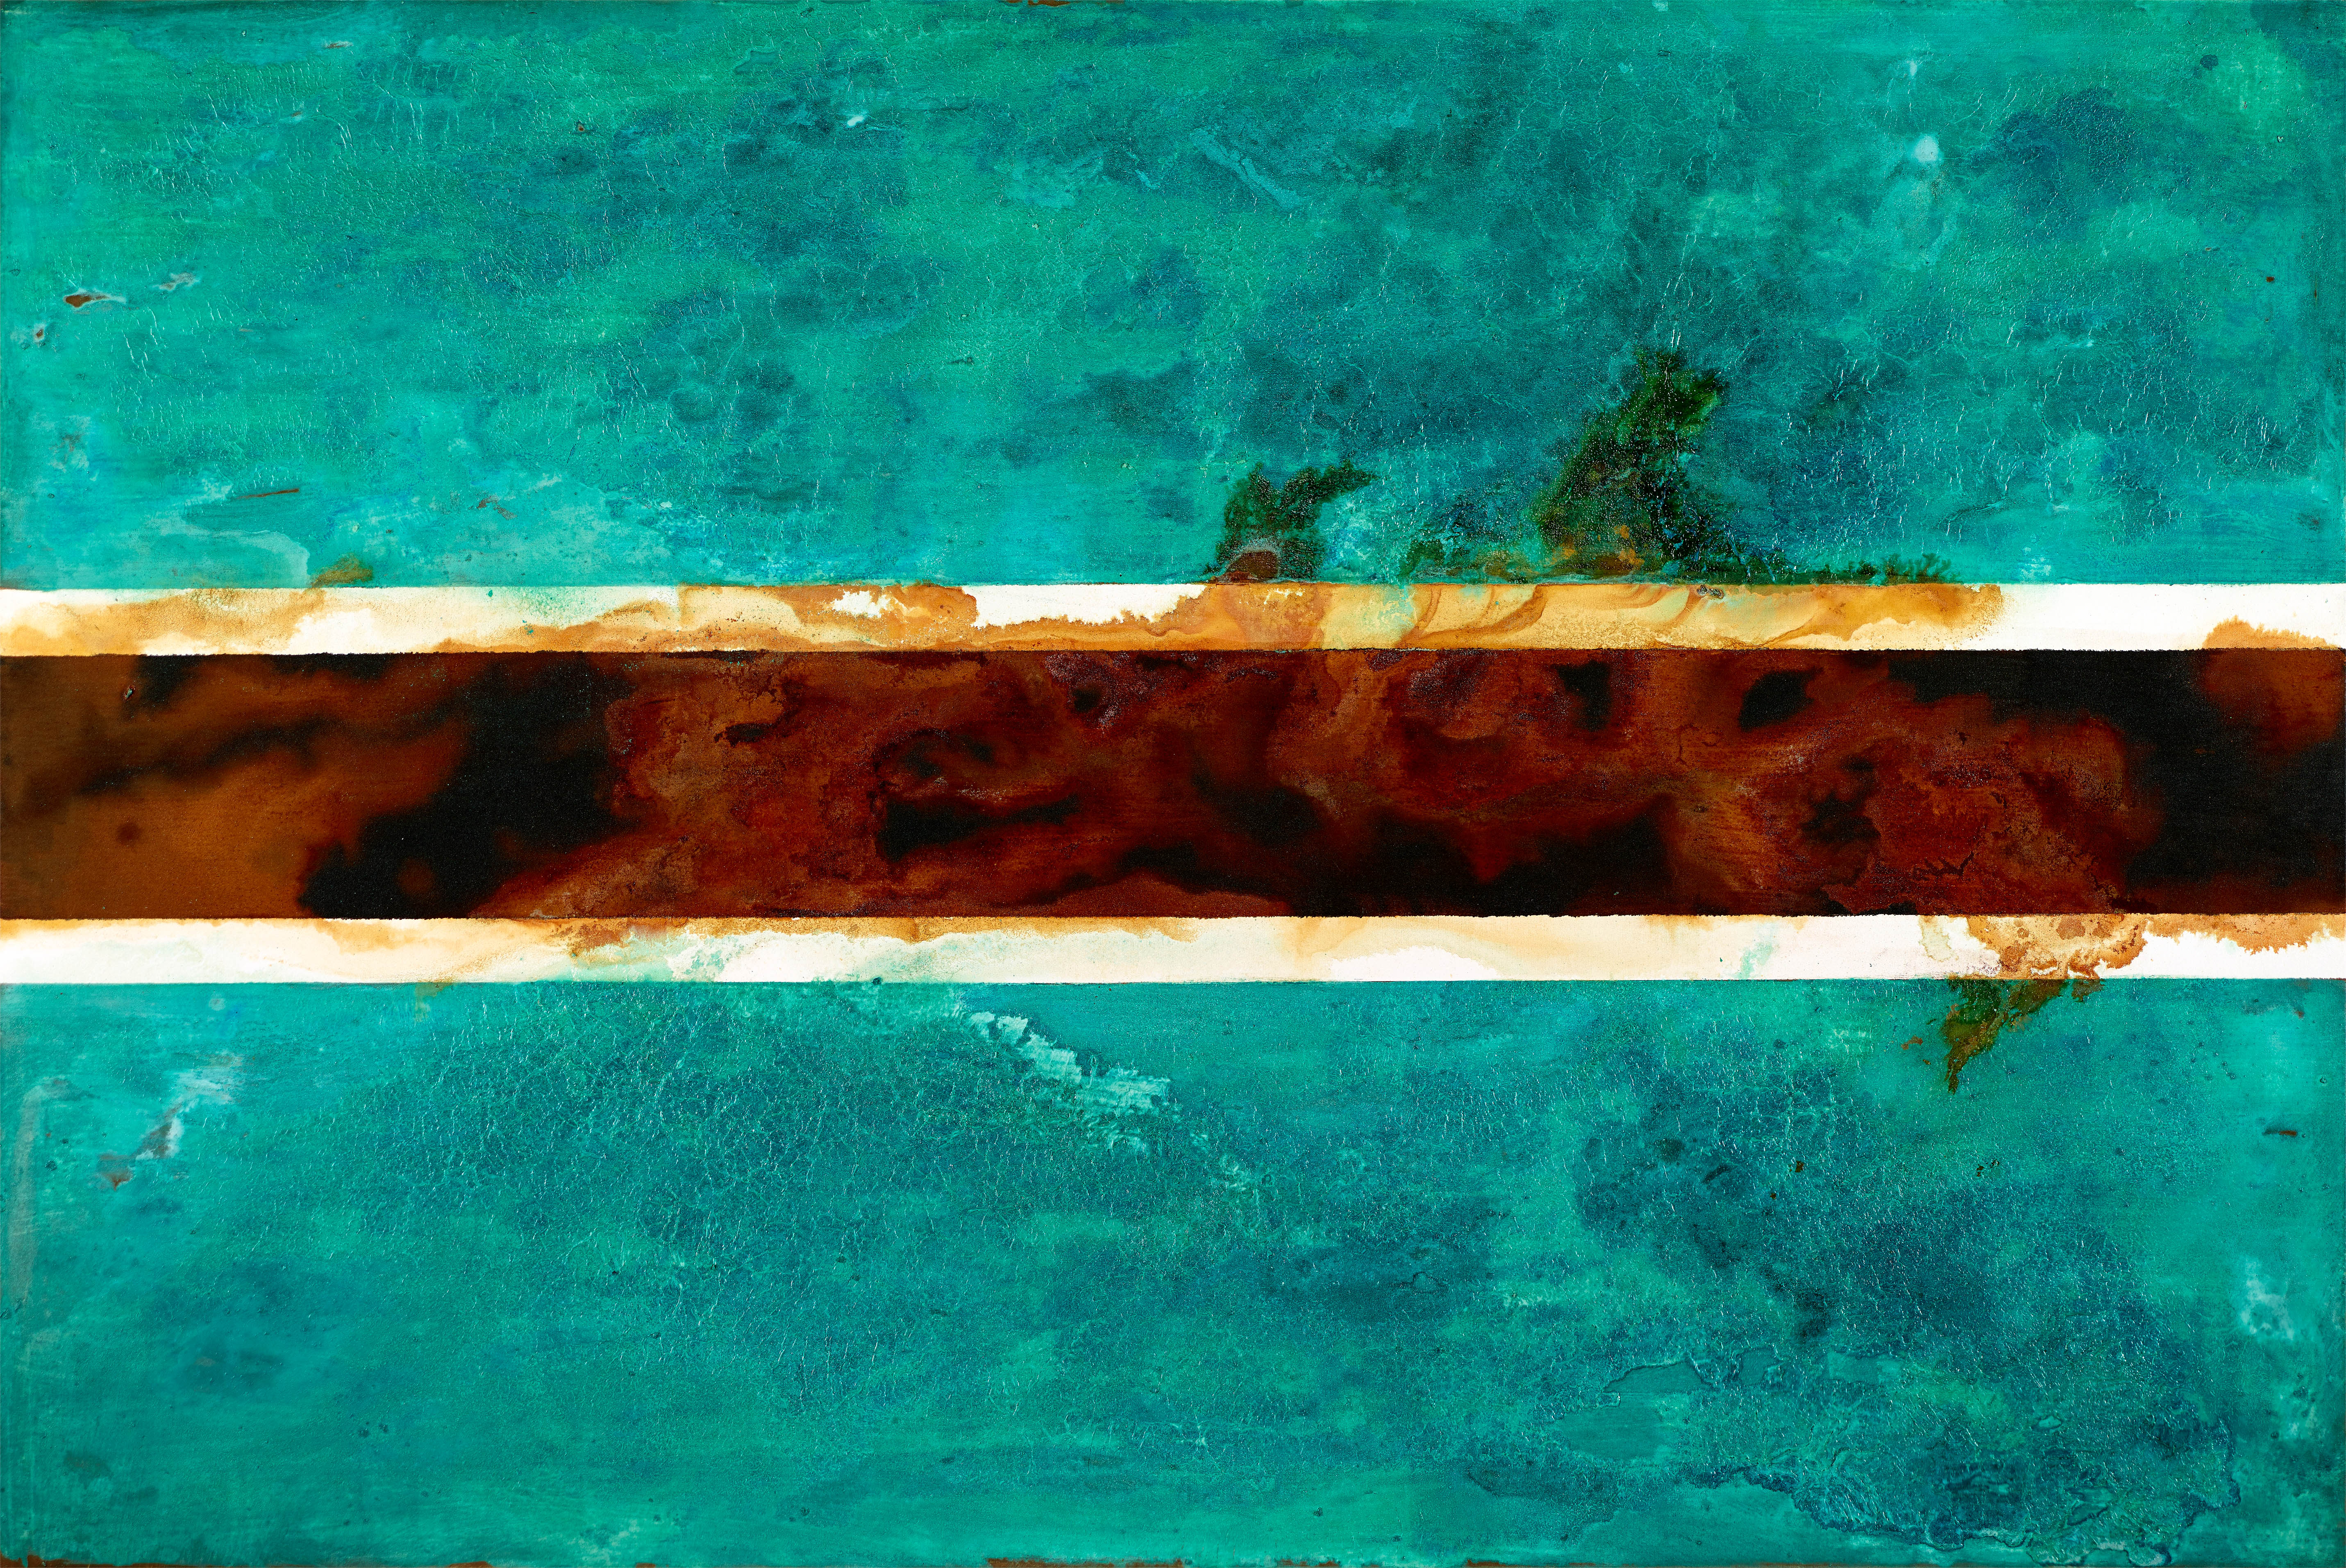 Bostwana -mixed rust medium and acrylic on canvas 1.2m x 1.8m -  HHR